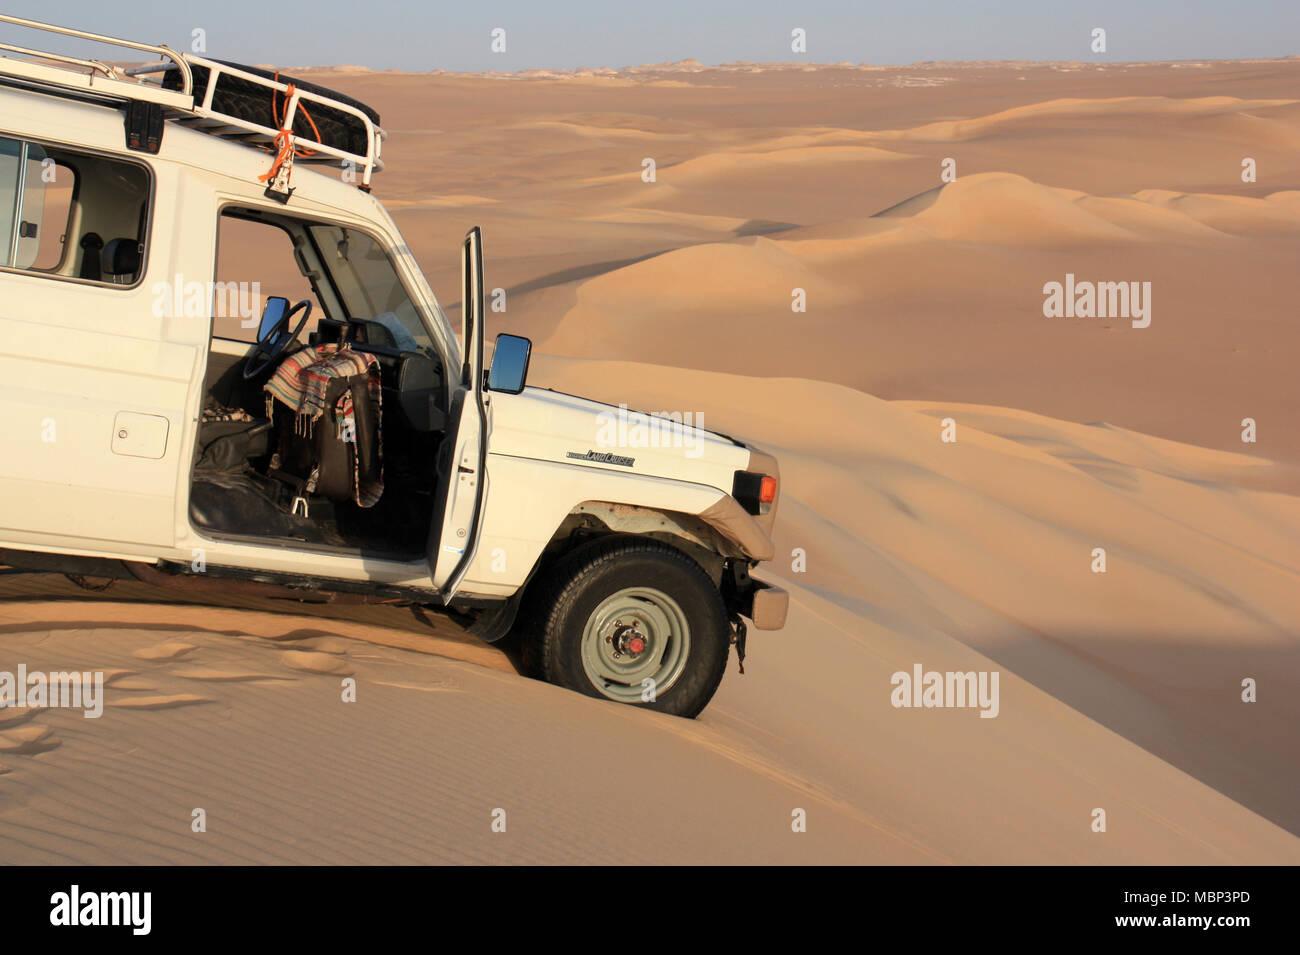 Going Off-road during a Sahara Desert Safari - Stock Image